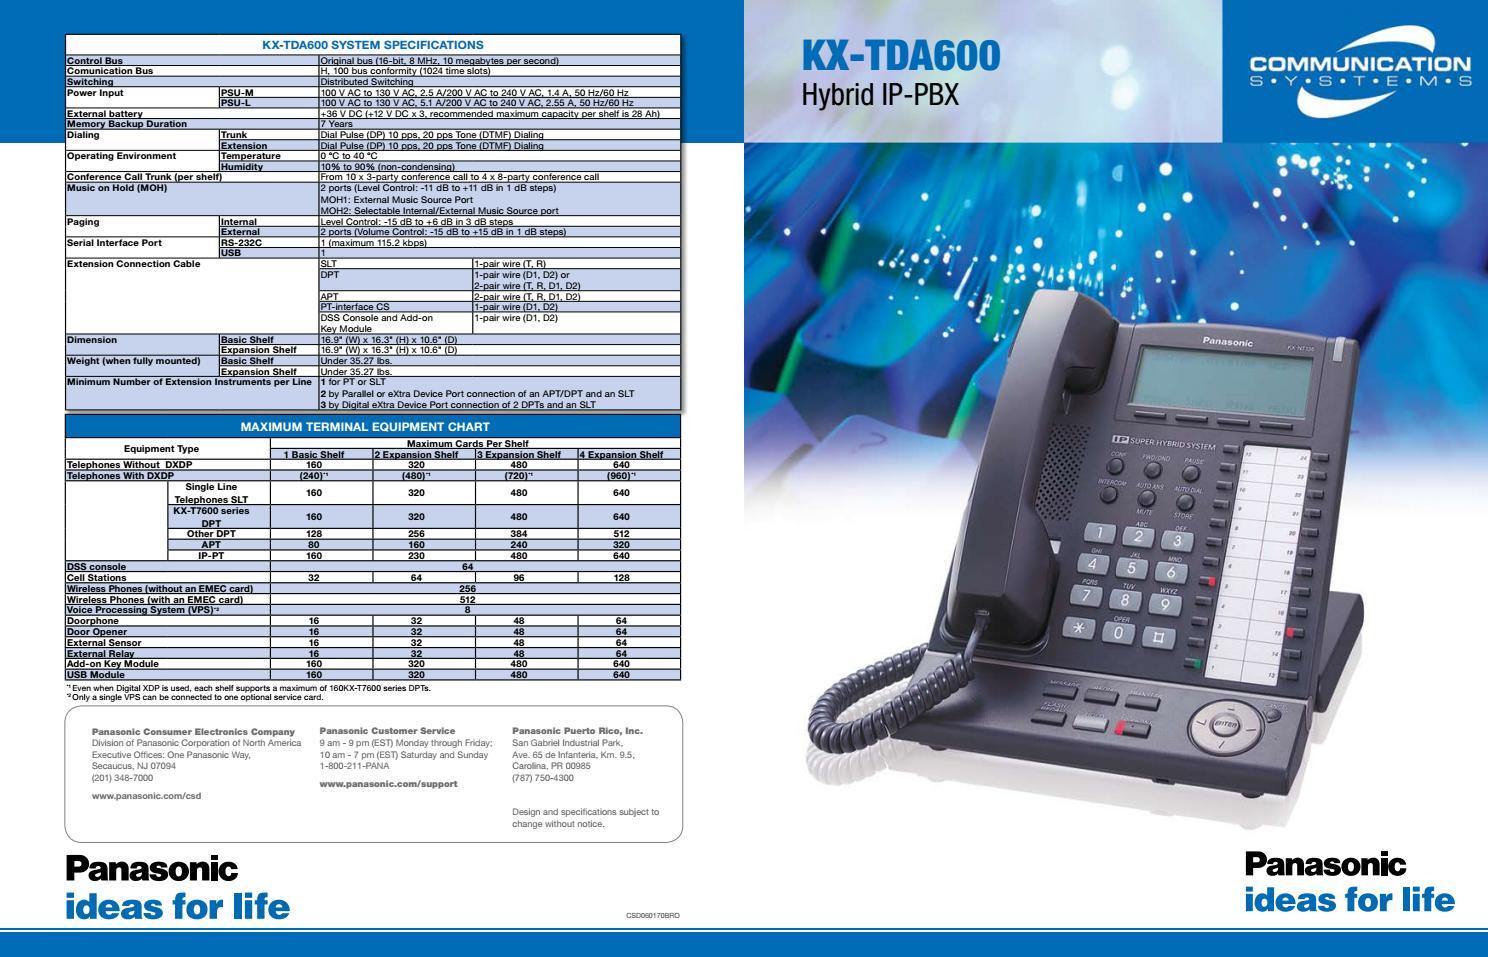 PANASONIC KX TDA600 DRIVERS FOR WINDOWS 7